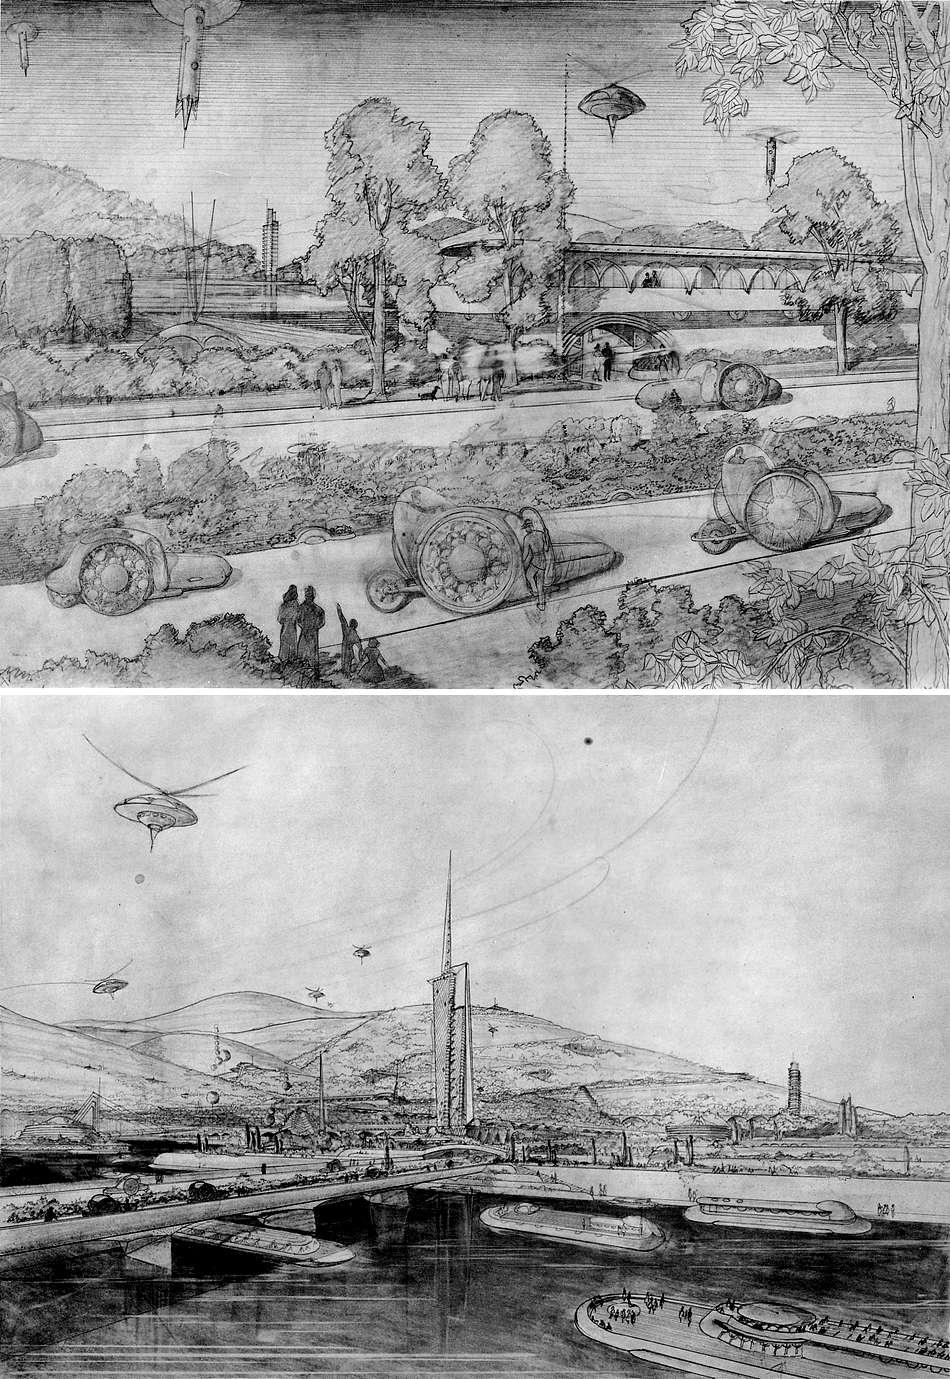 Broadacre city wikipedia